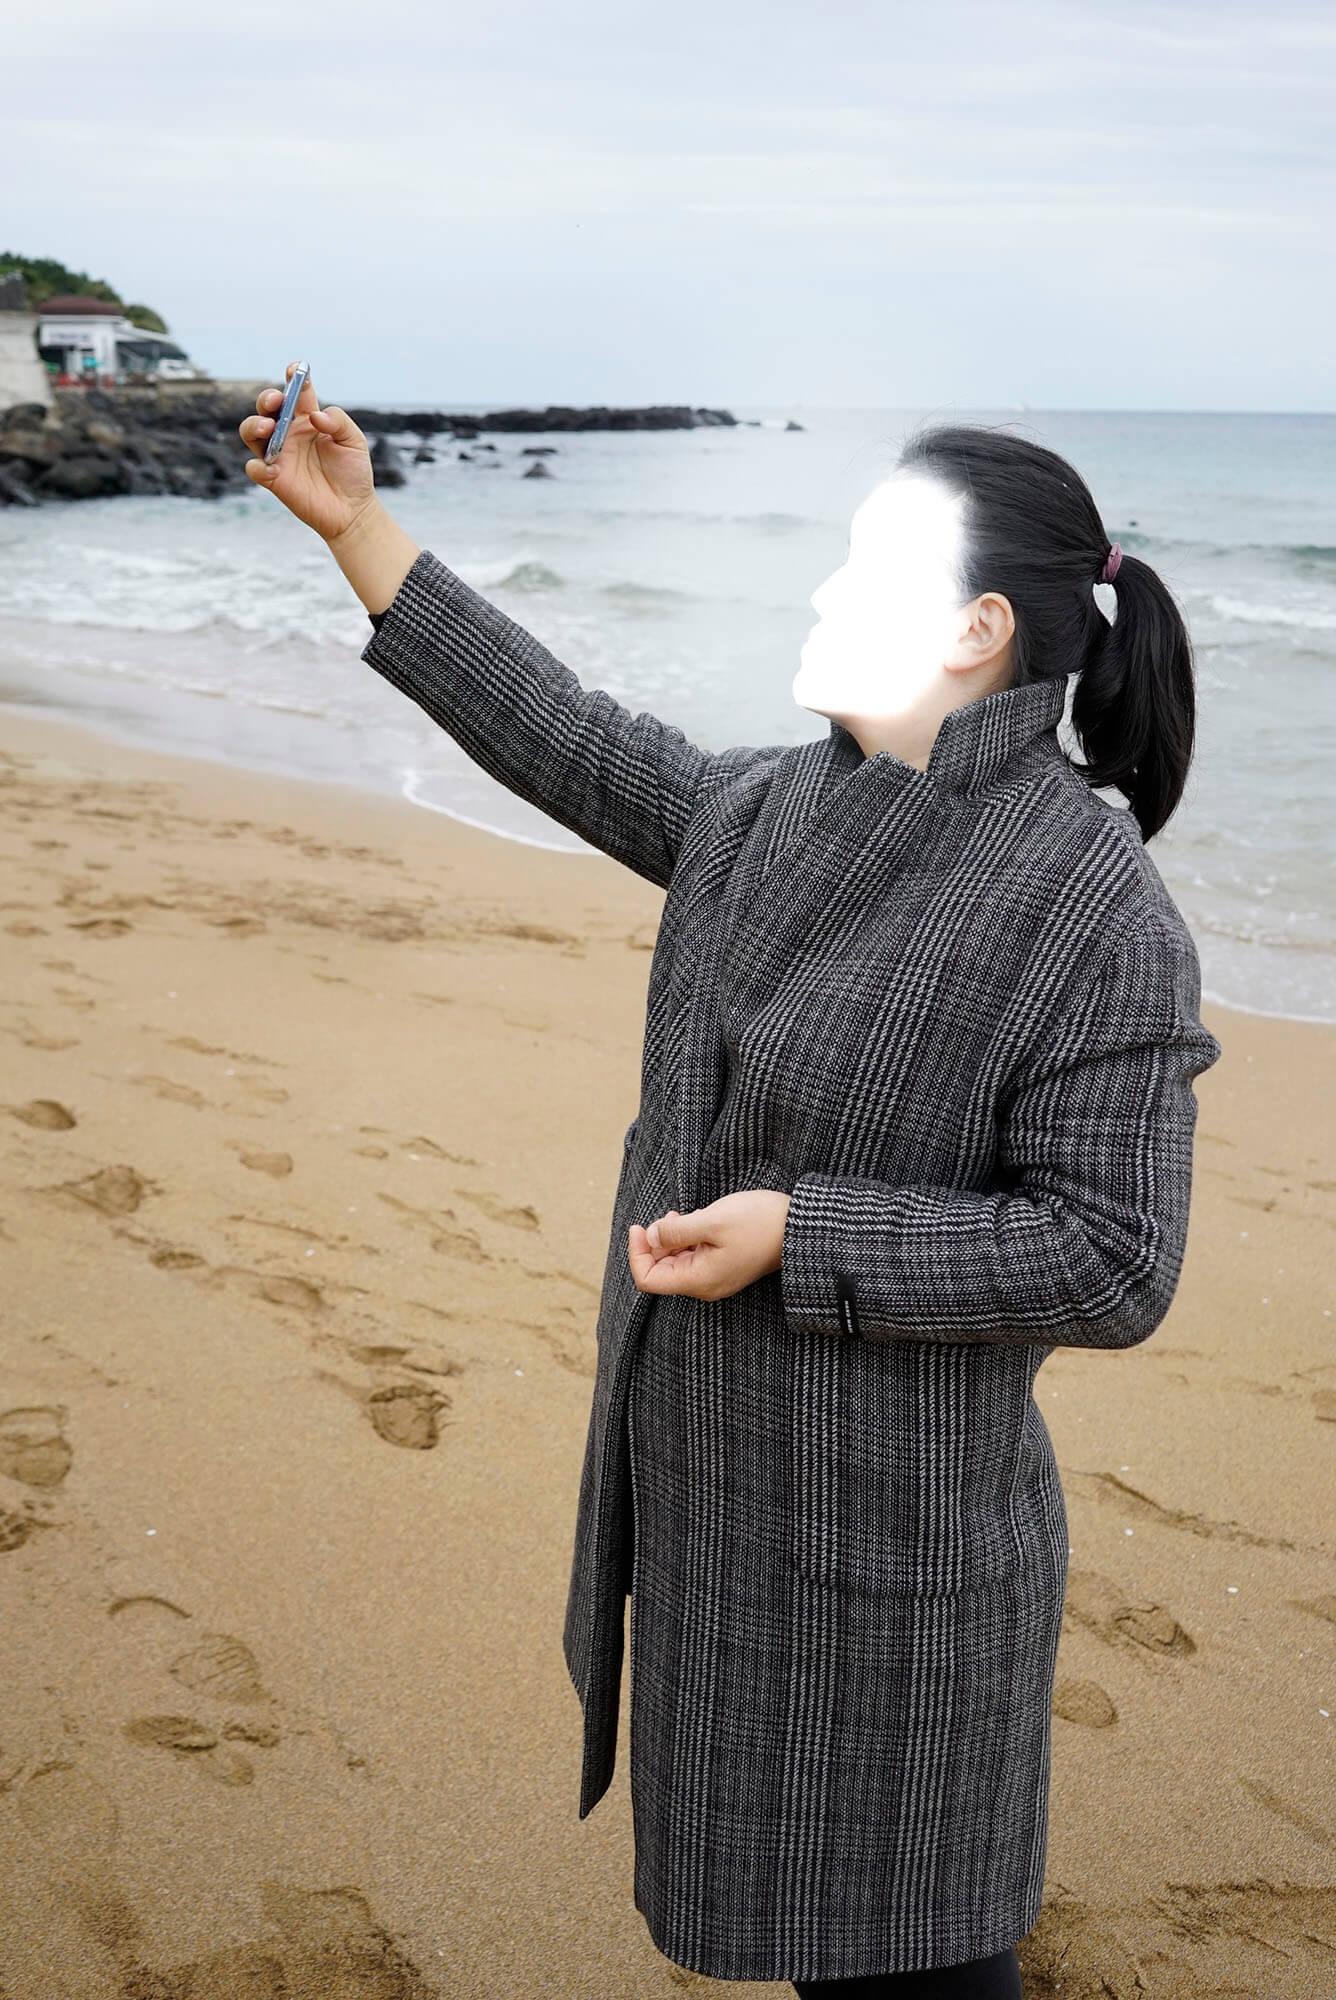 Modern-Geisha-Edited-on-my-smartphone-series-2019-©-Dagny-Hay